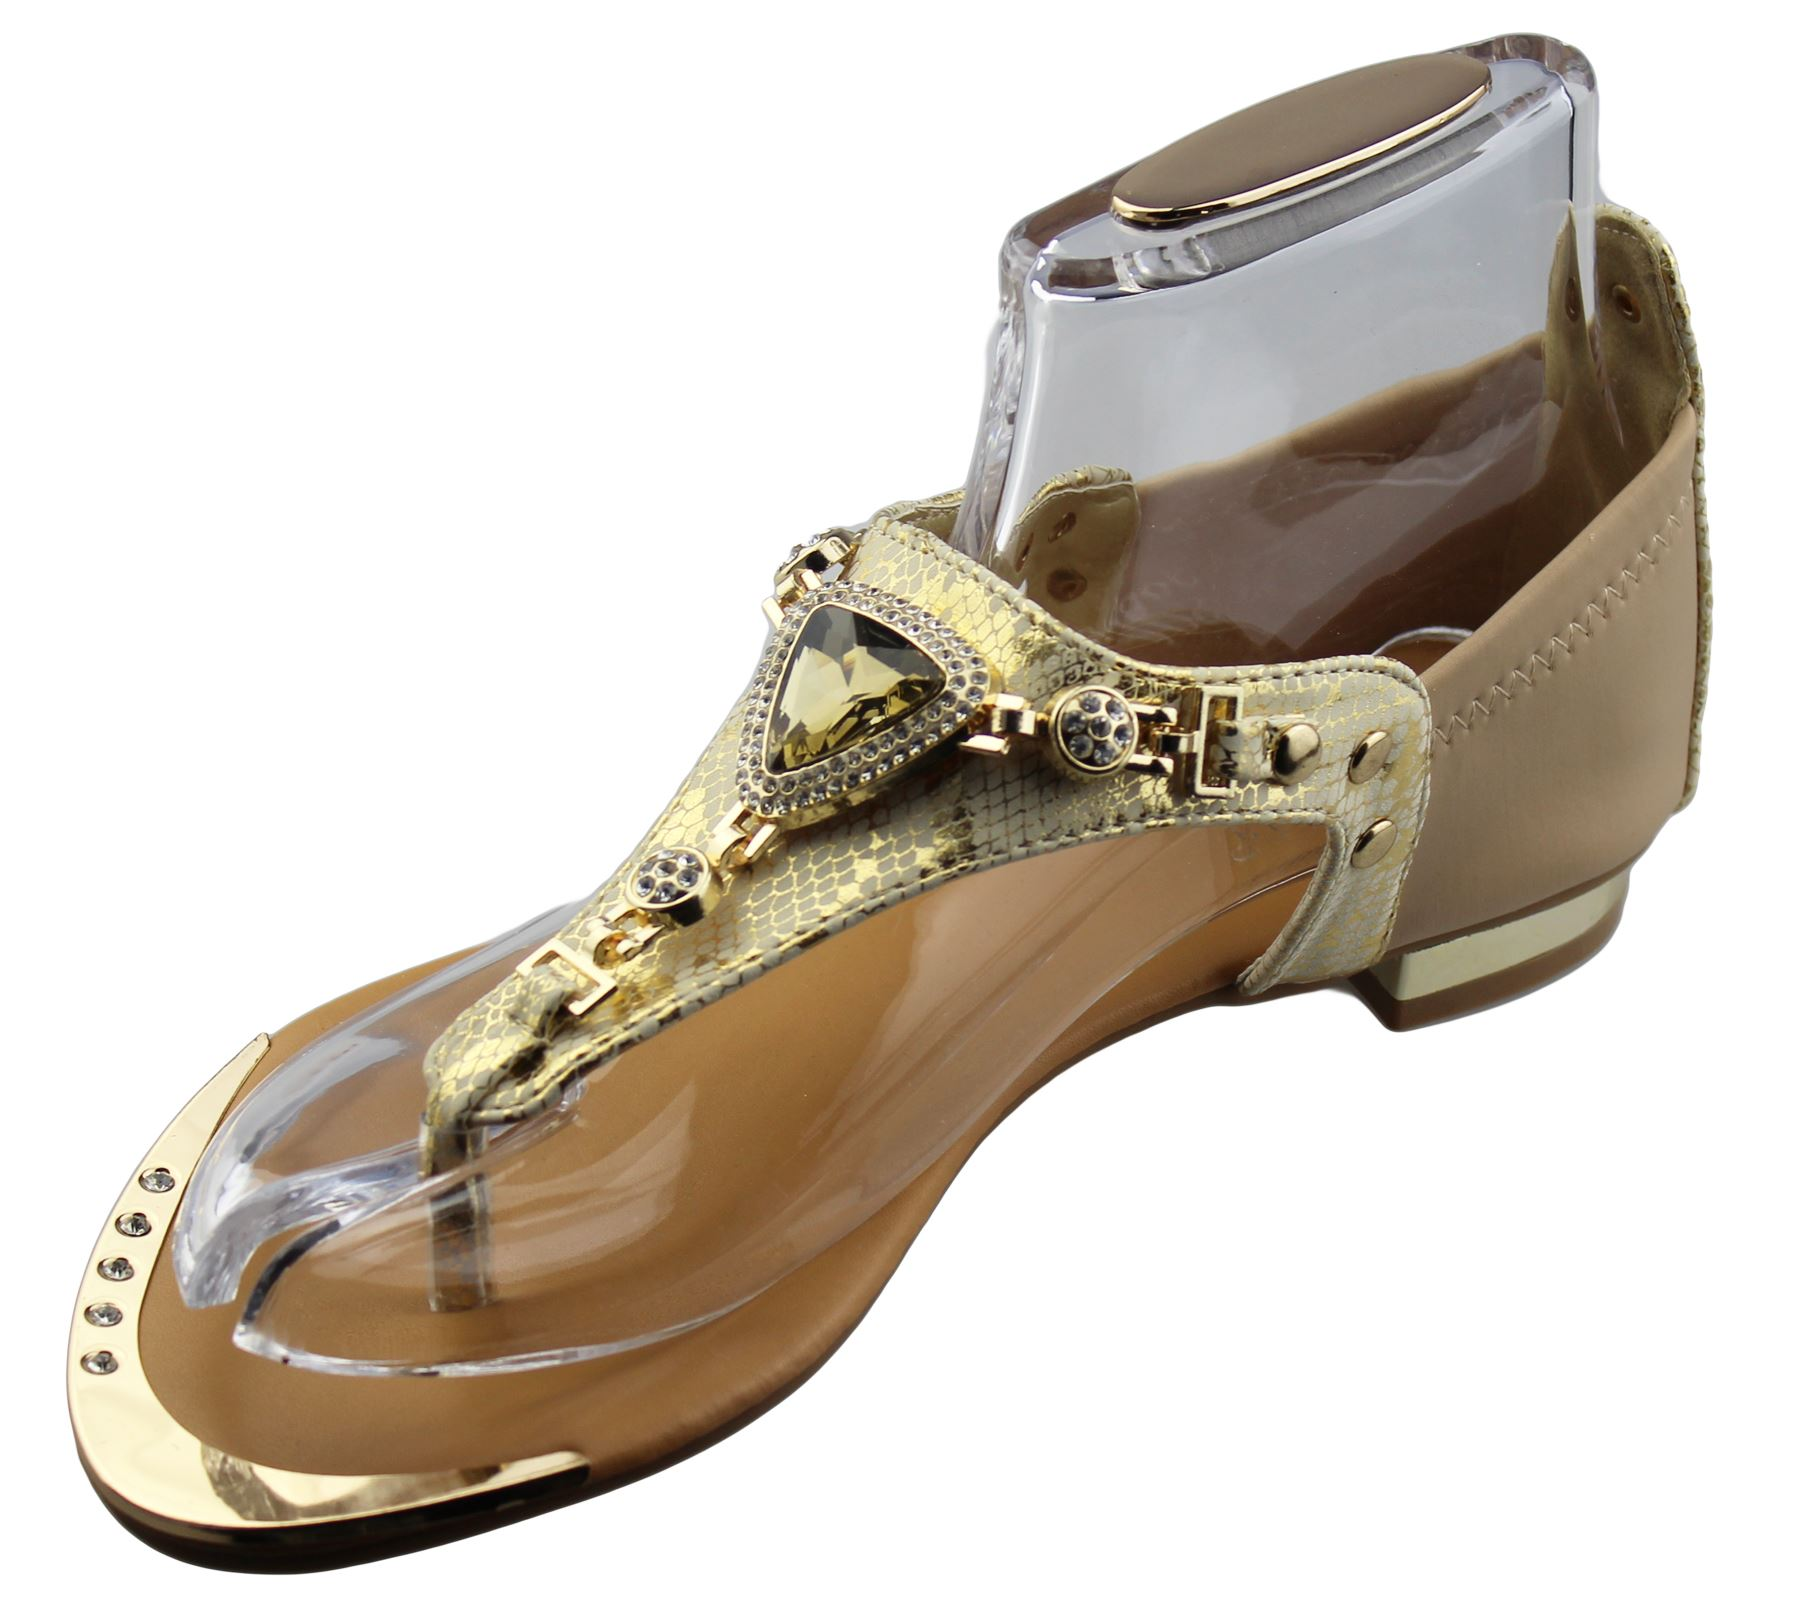 Womens-Flat-Summer-Sandals-Ladies-Diamante-Wedding-Toe-Post-Casual-Slipper thumbnail 15